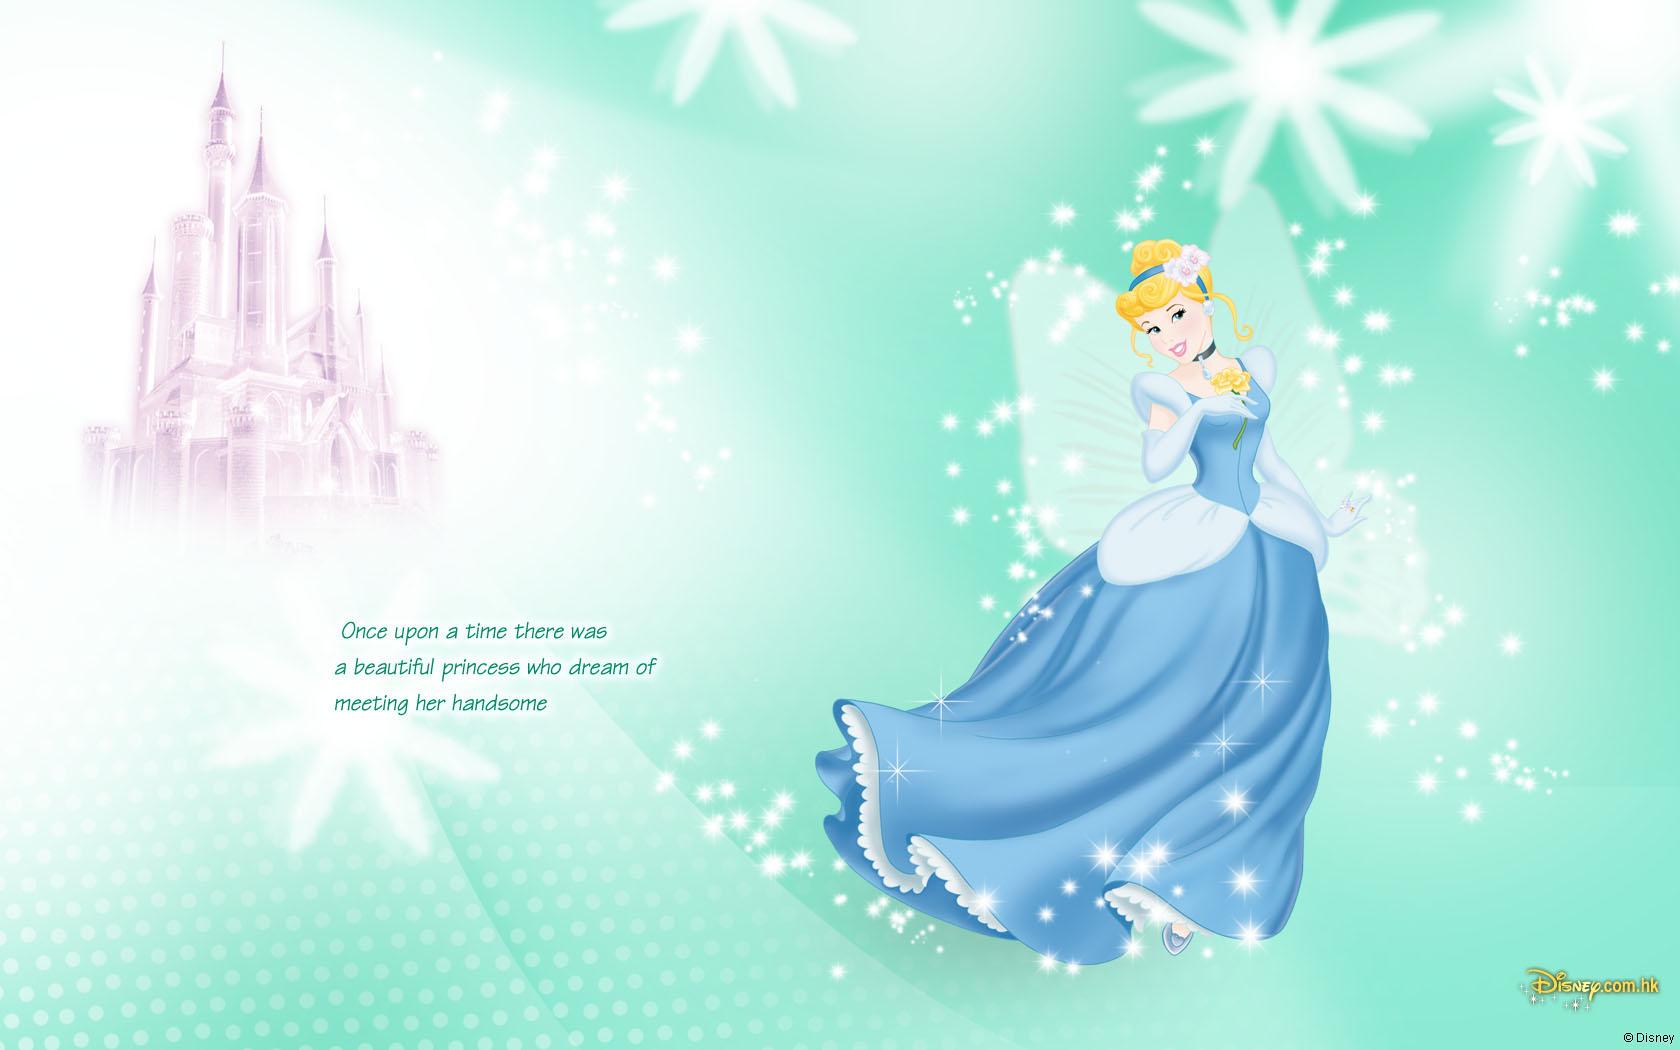 Princess Disney Wallpaper Widescreen 10108 Wallpaper Cool 1680x1050